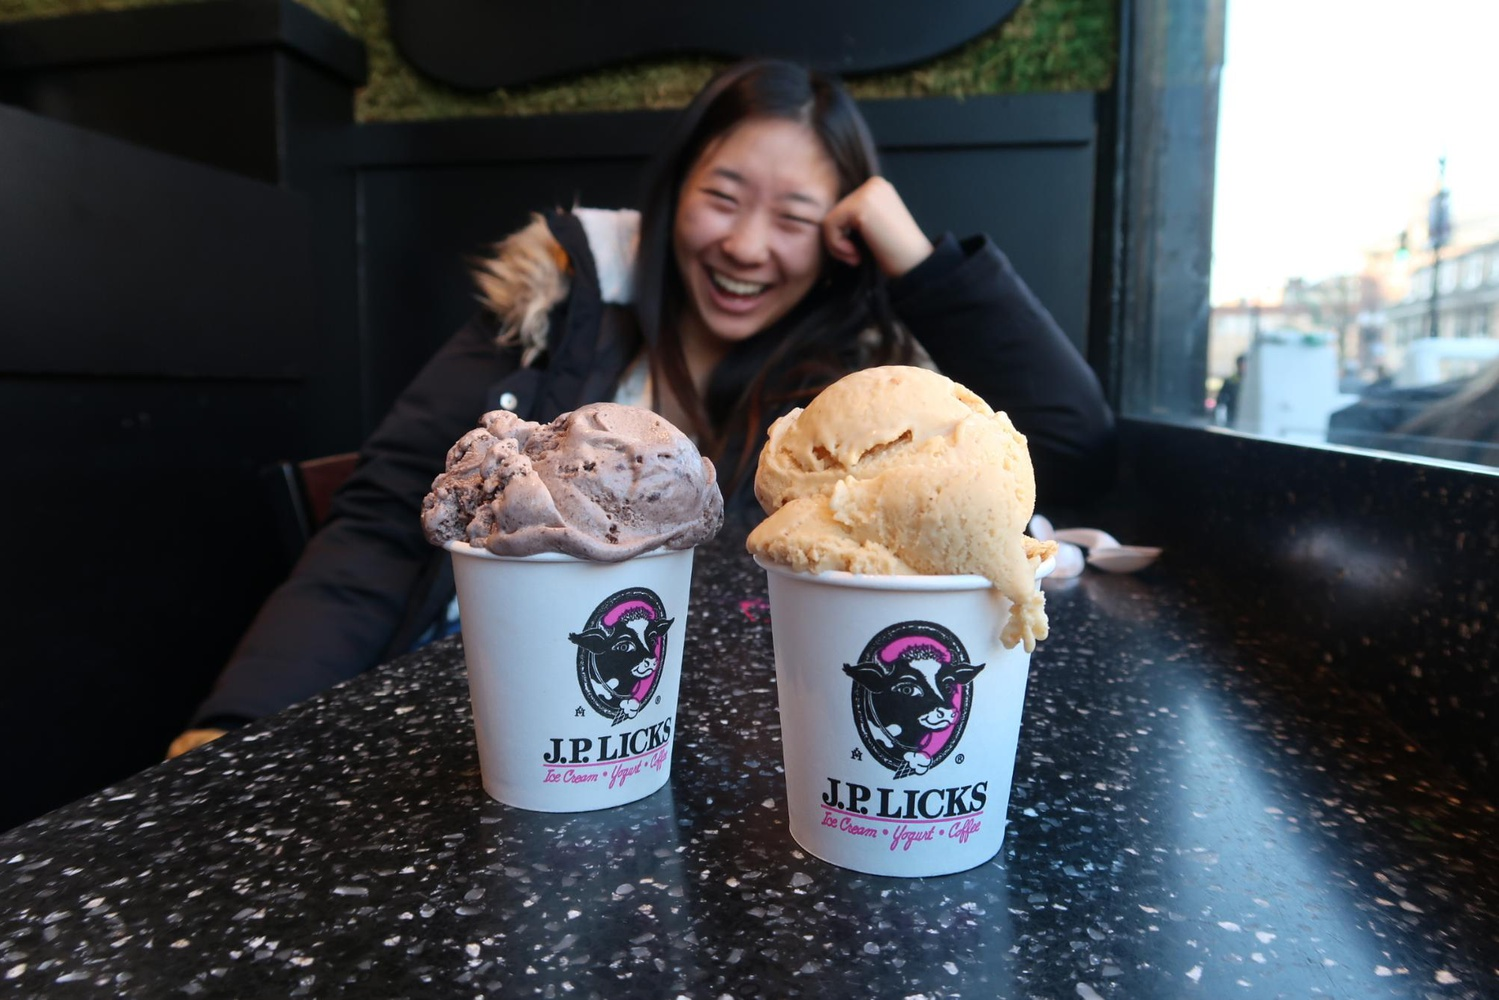 Adorable Ellen and her ice cream